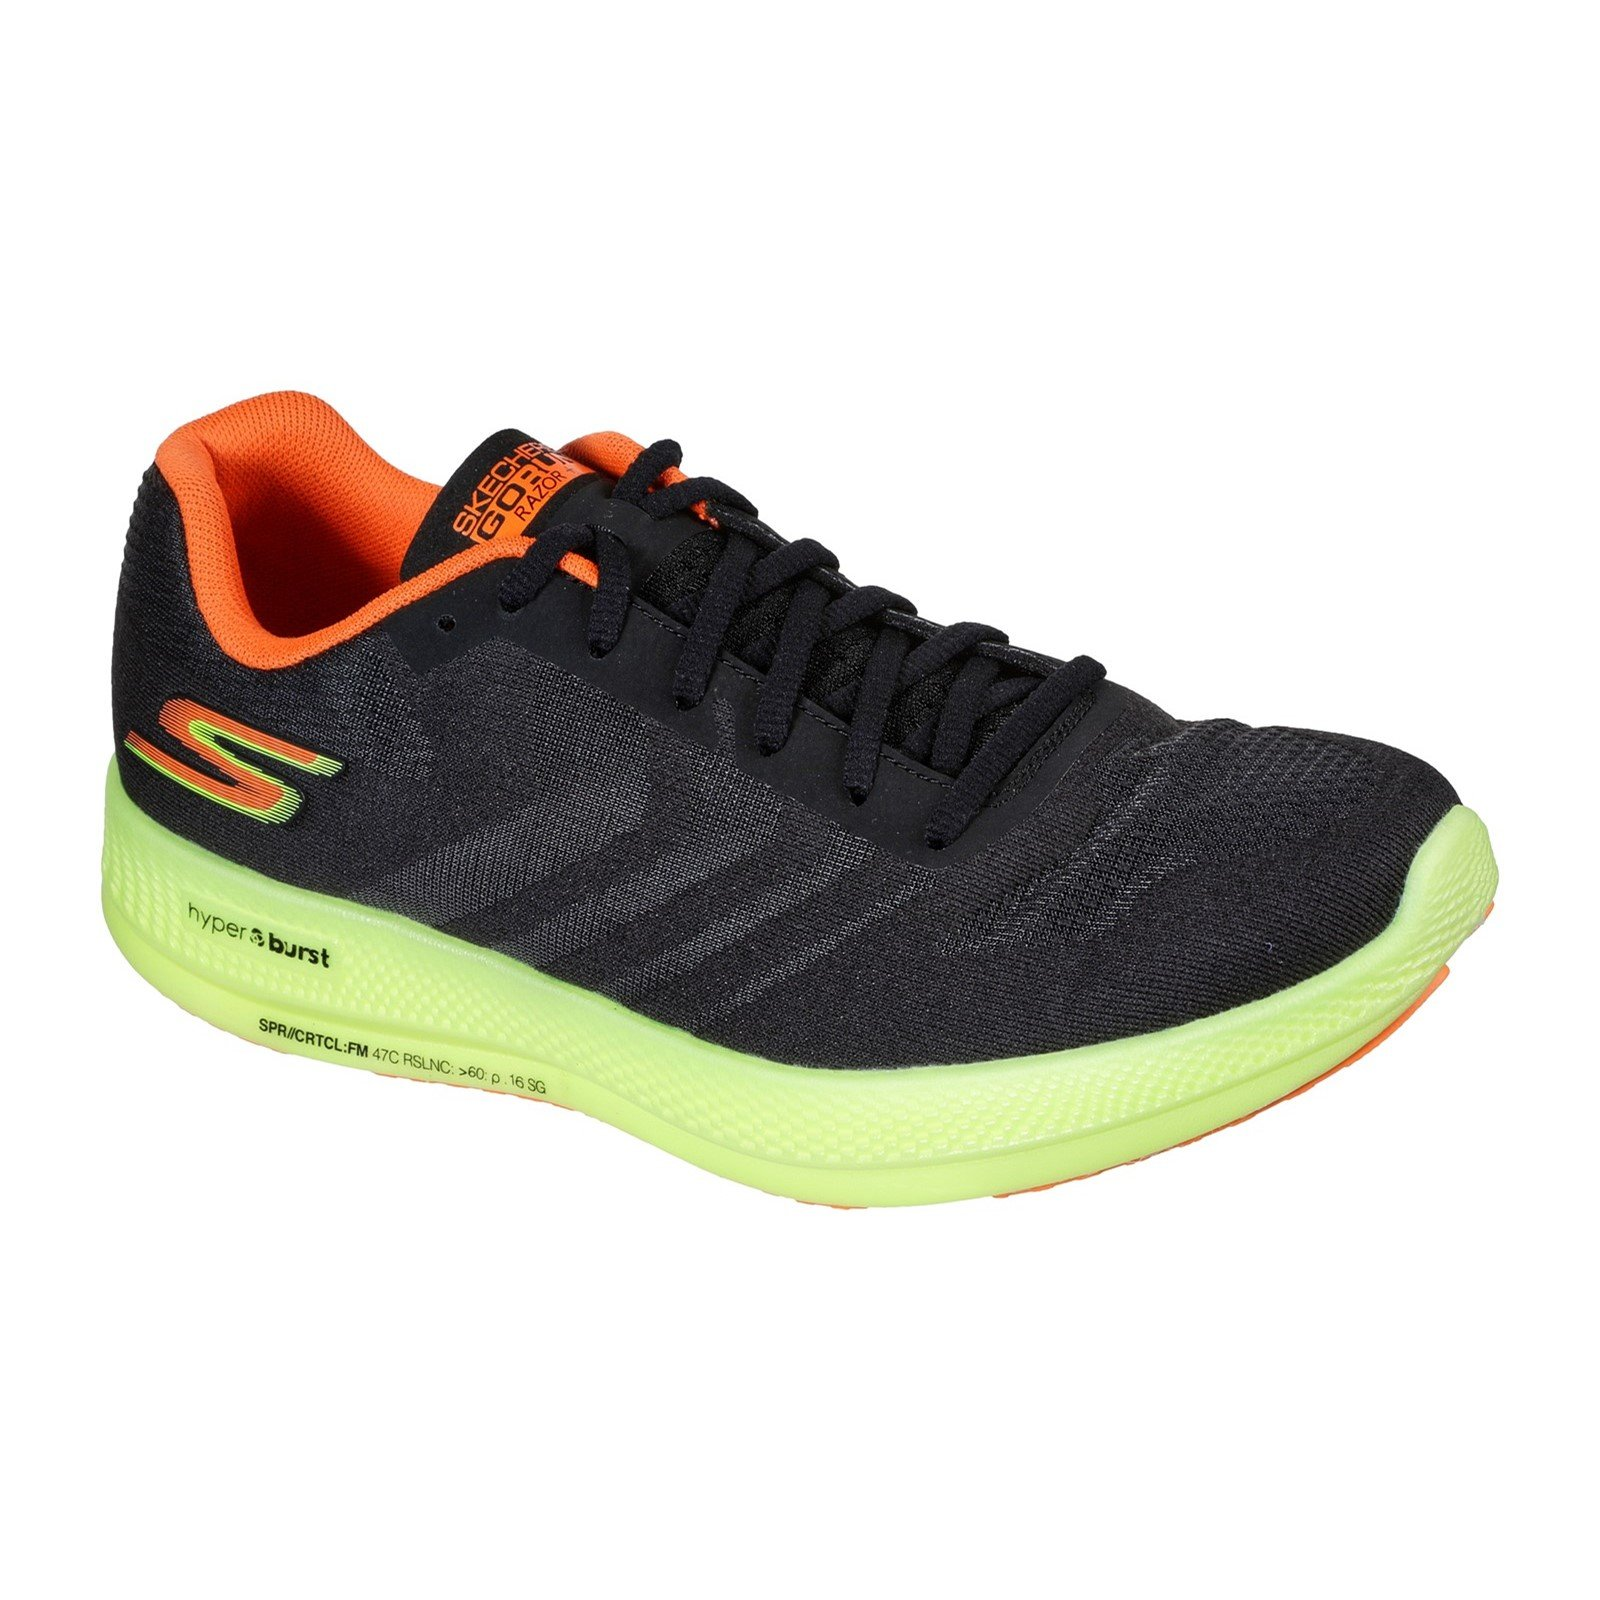 Skechers Women's Go Run Razor Trainer Various Colours 32703 - Black/Yellow/Orange 5